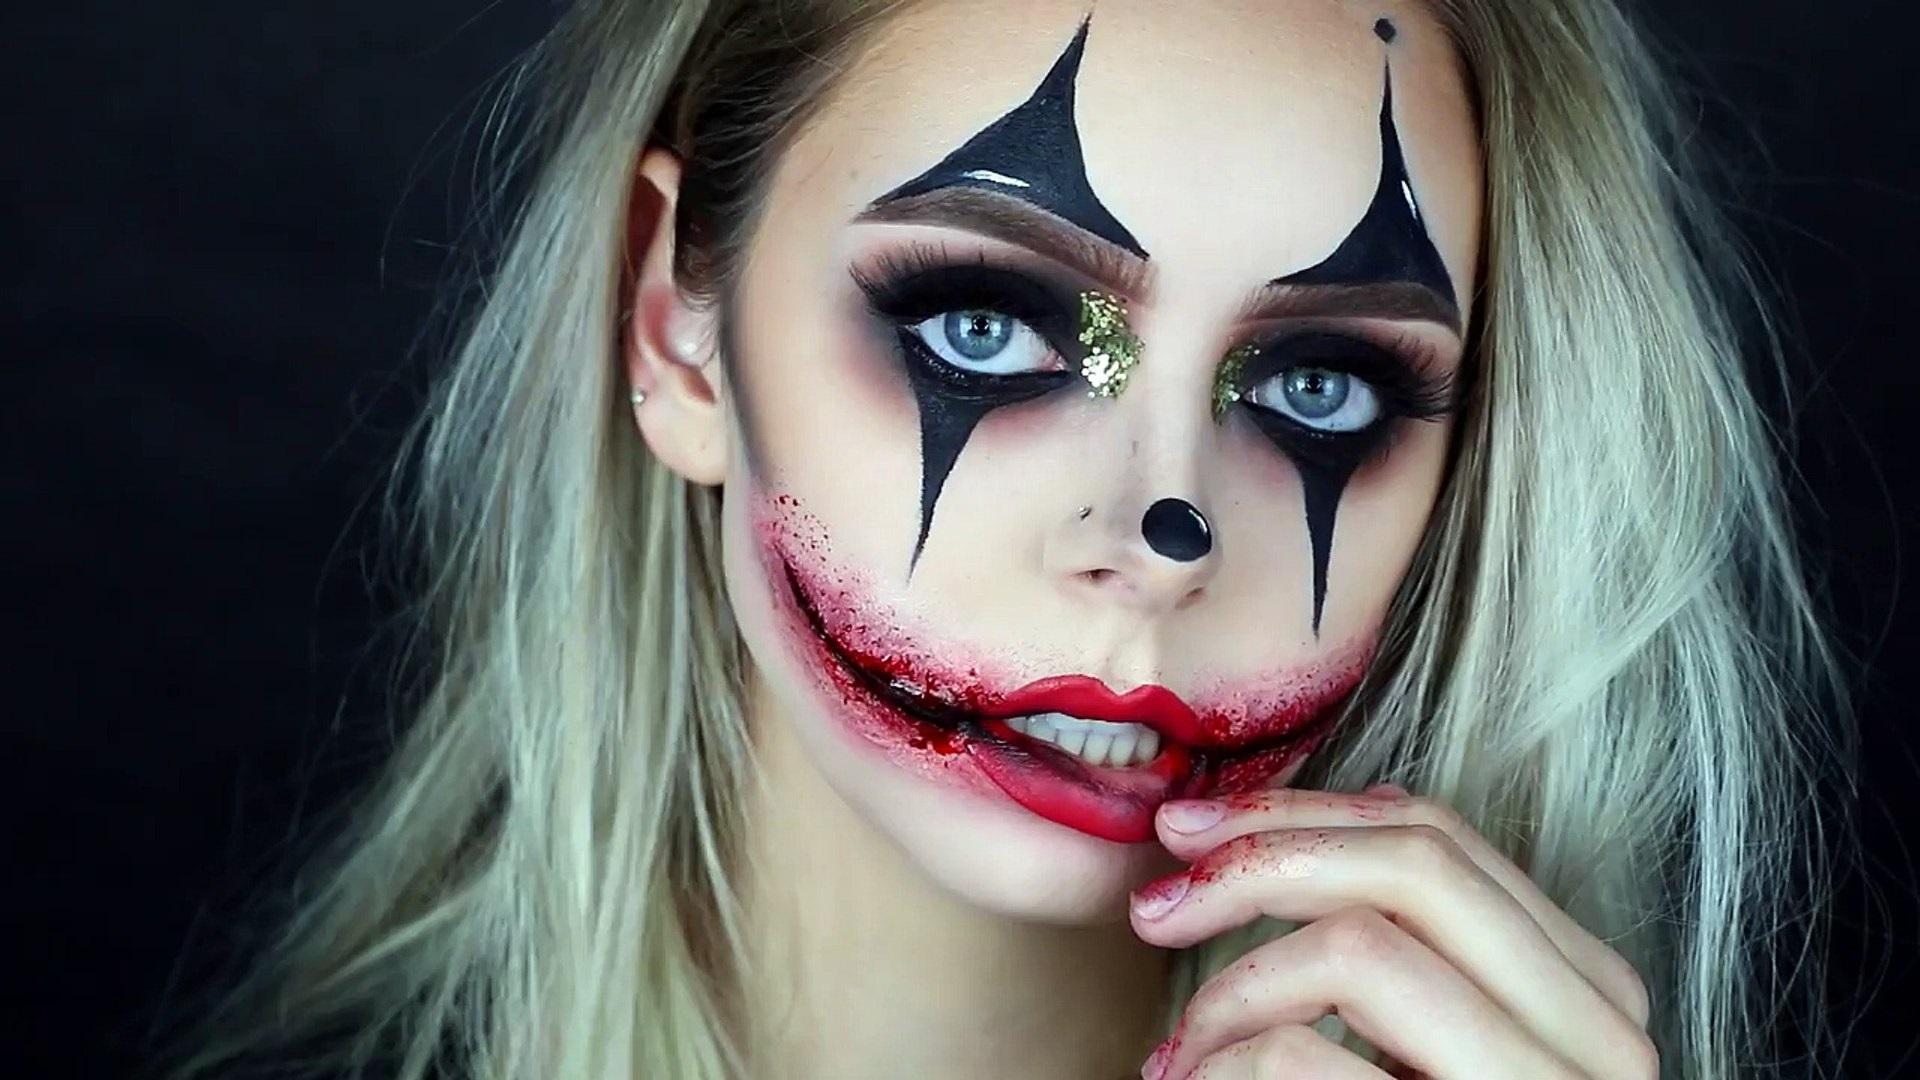 Мaquillage clown pour Halloween.